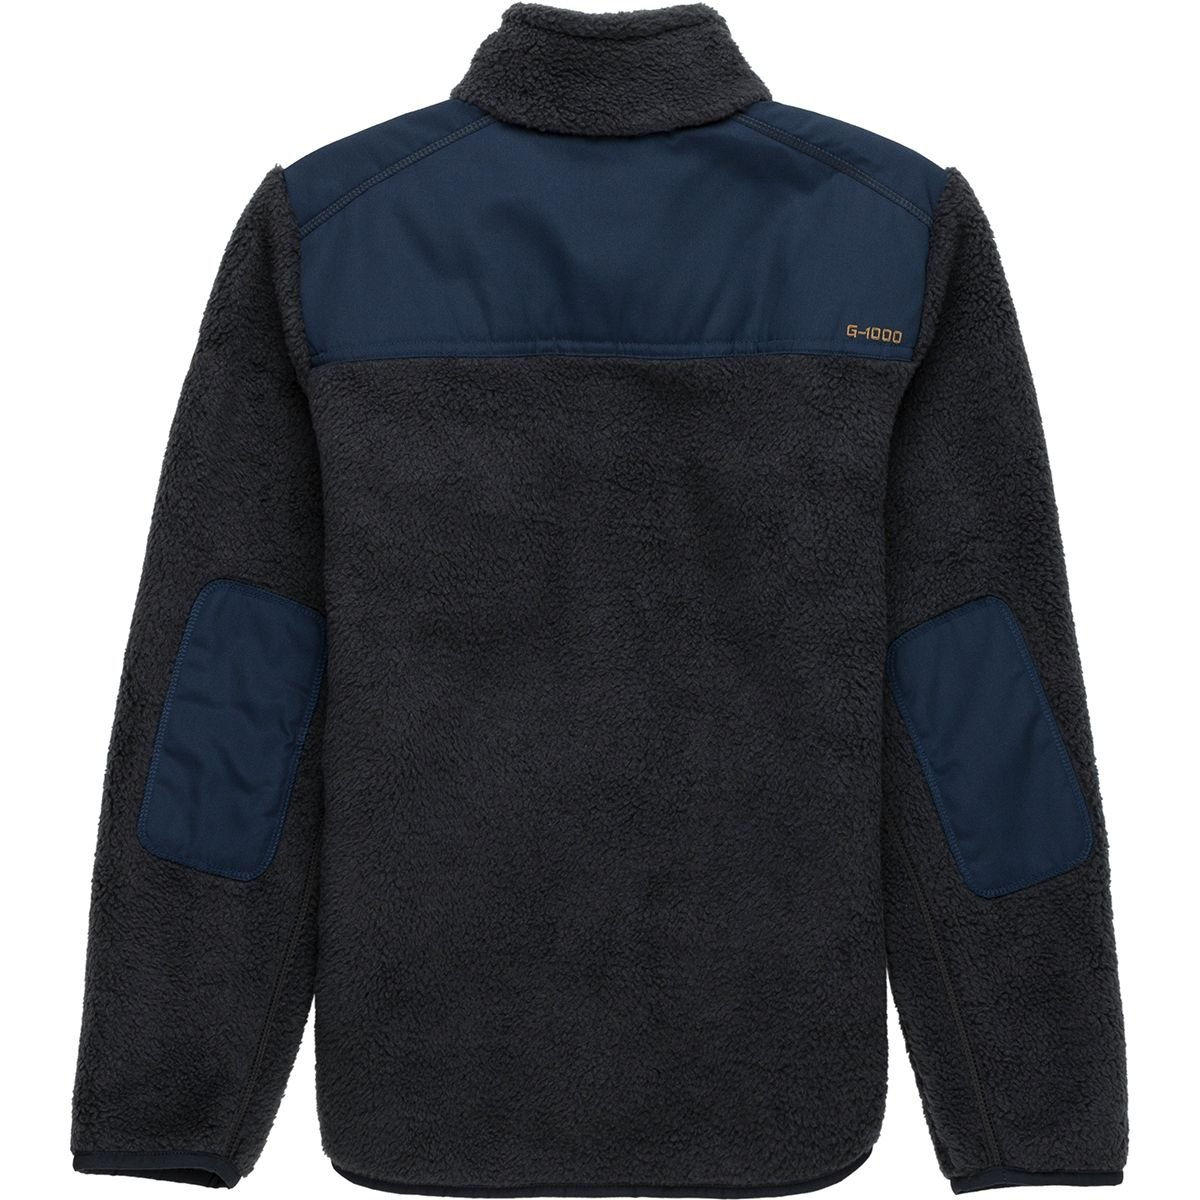 FJ/ÄLLR/ÄVEN Kinder Fleecejacke Singi Fleece Jacket